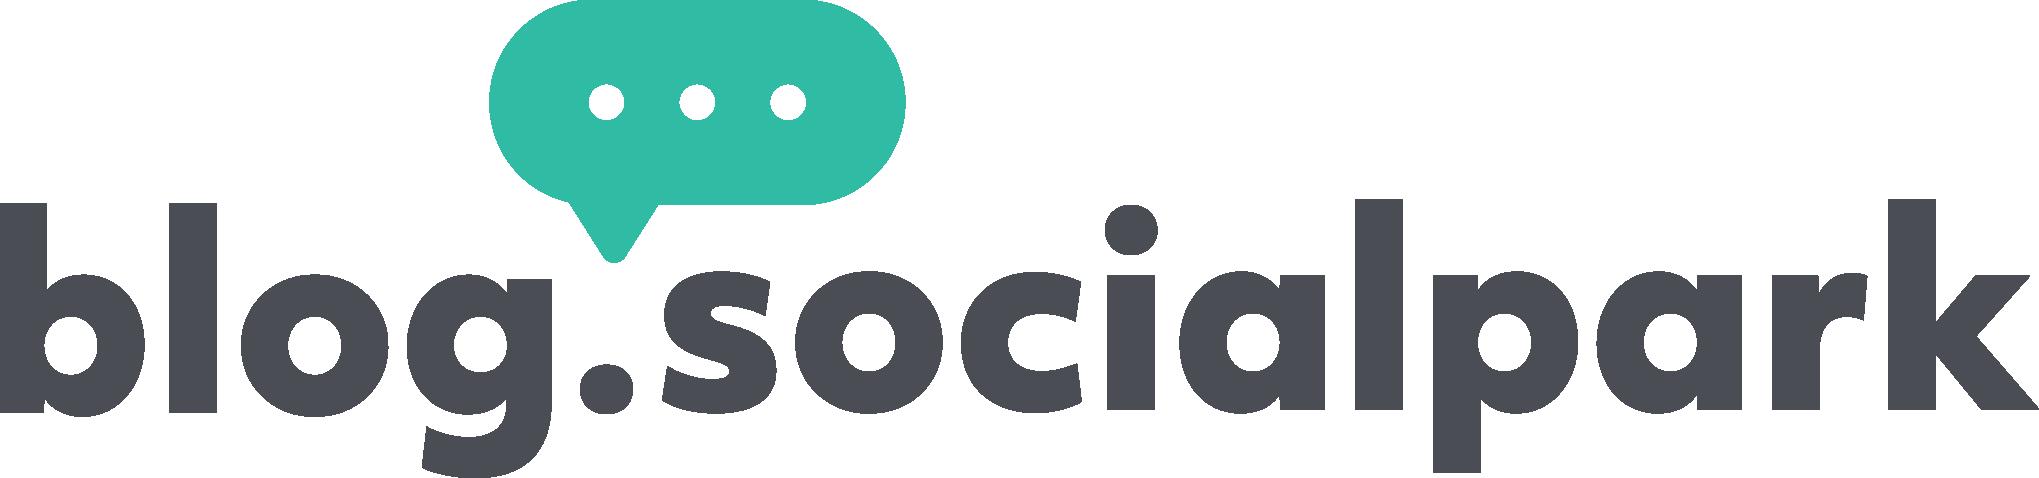 Blog Socialpark.cz